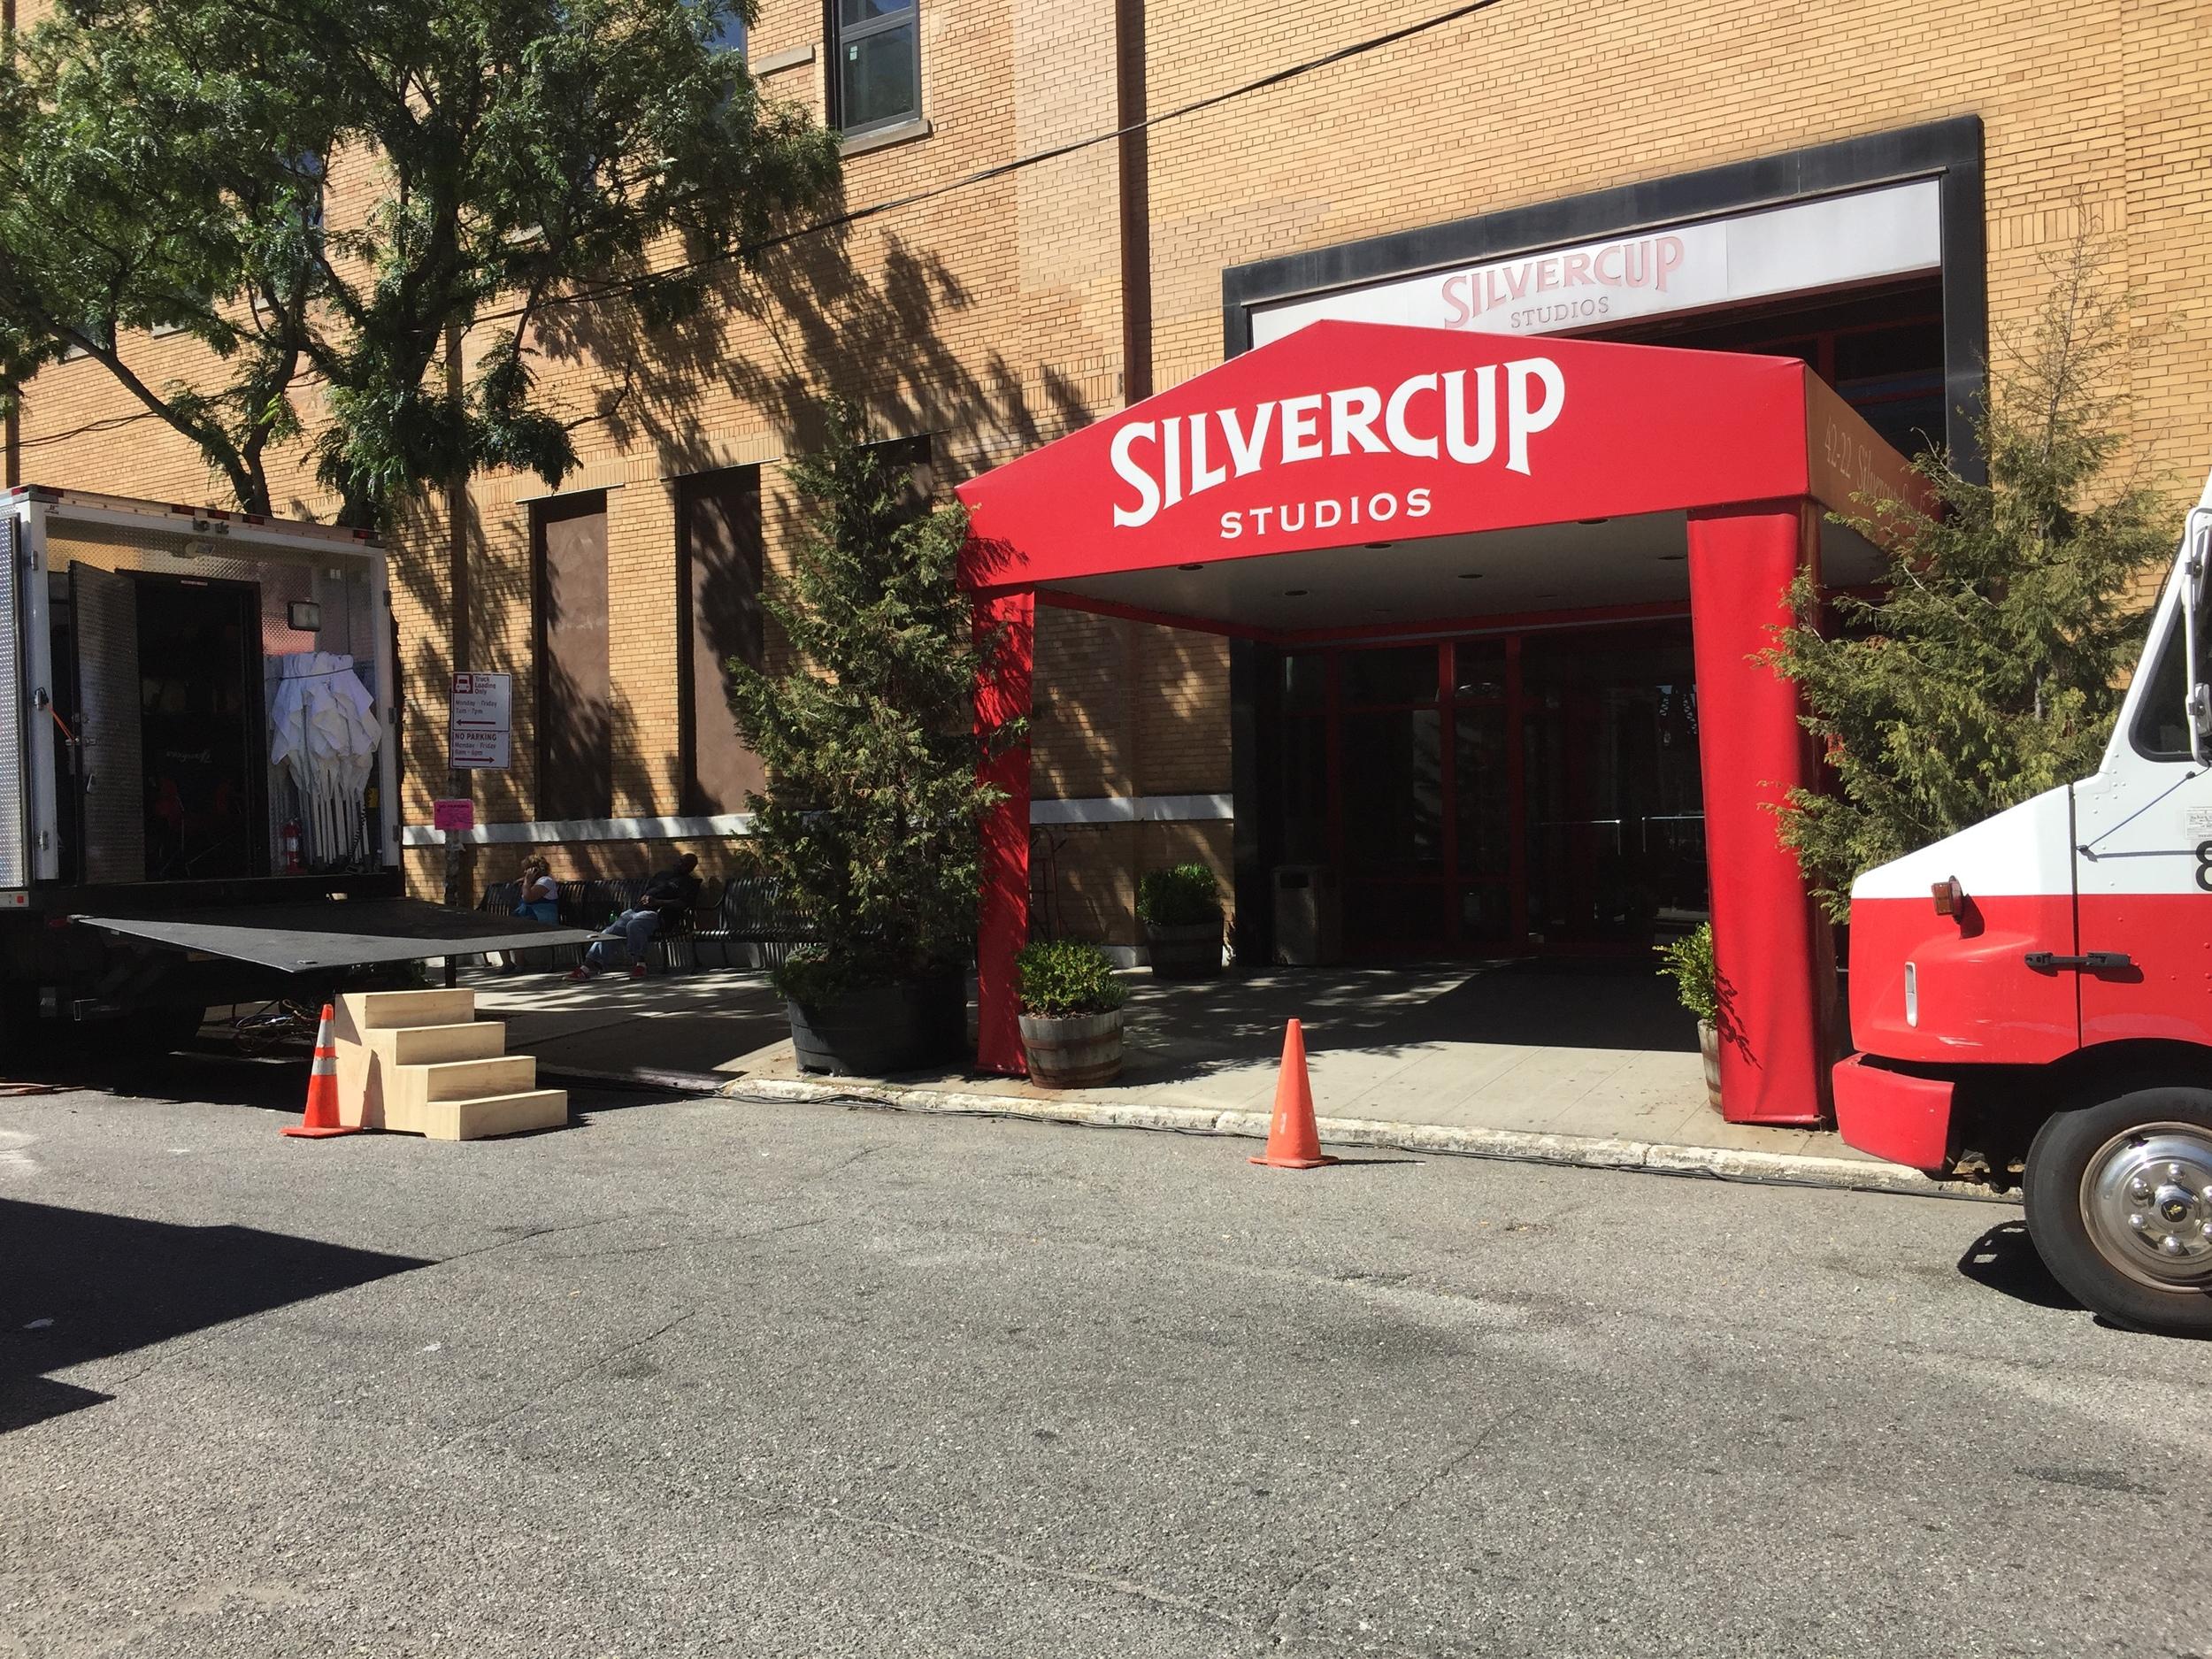 Silvercup Studios Entrance